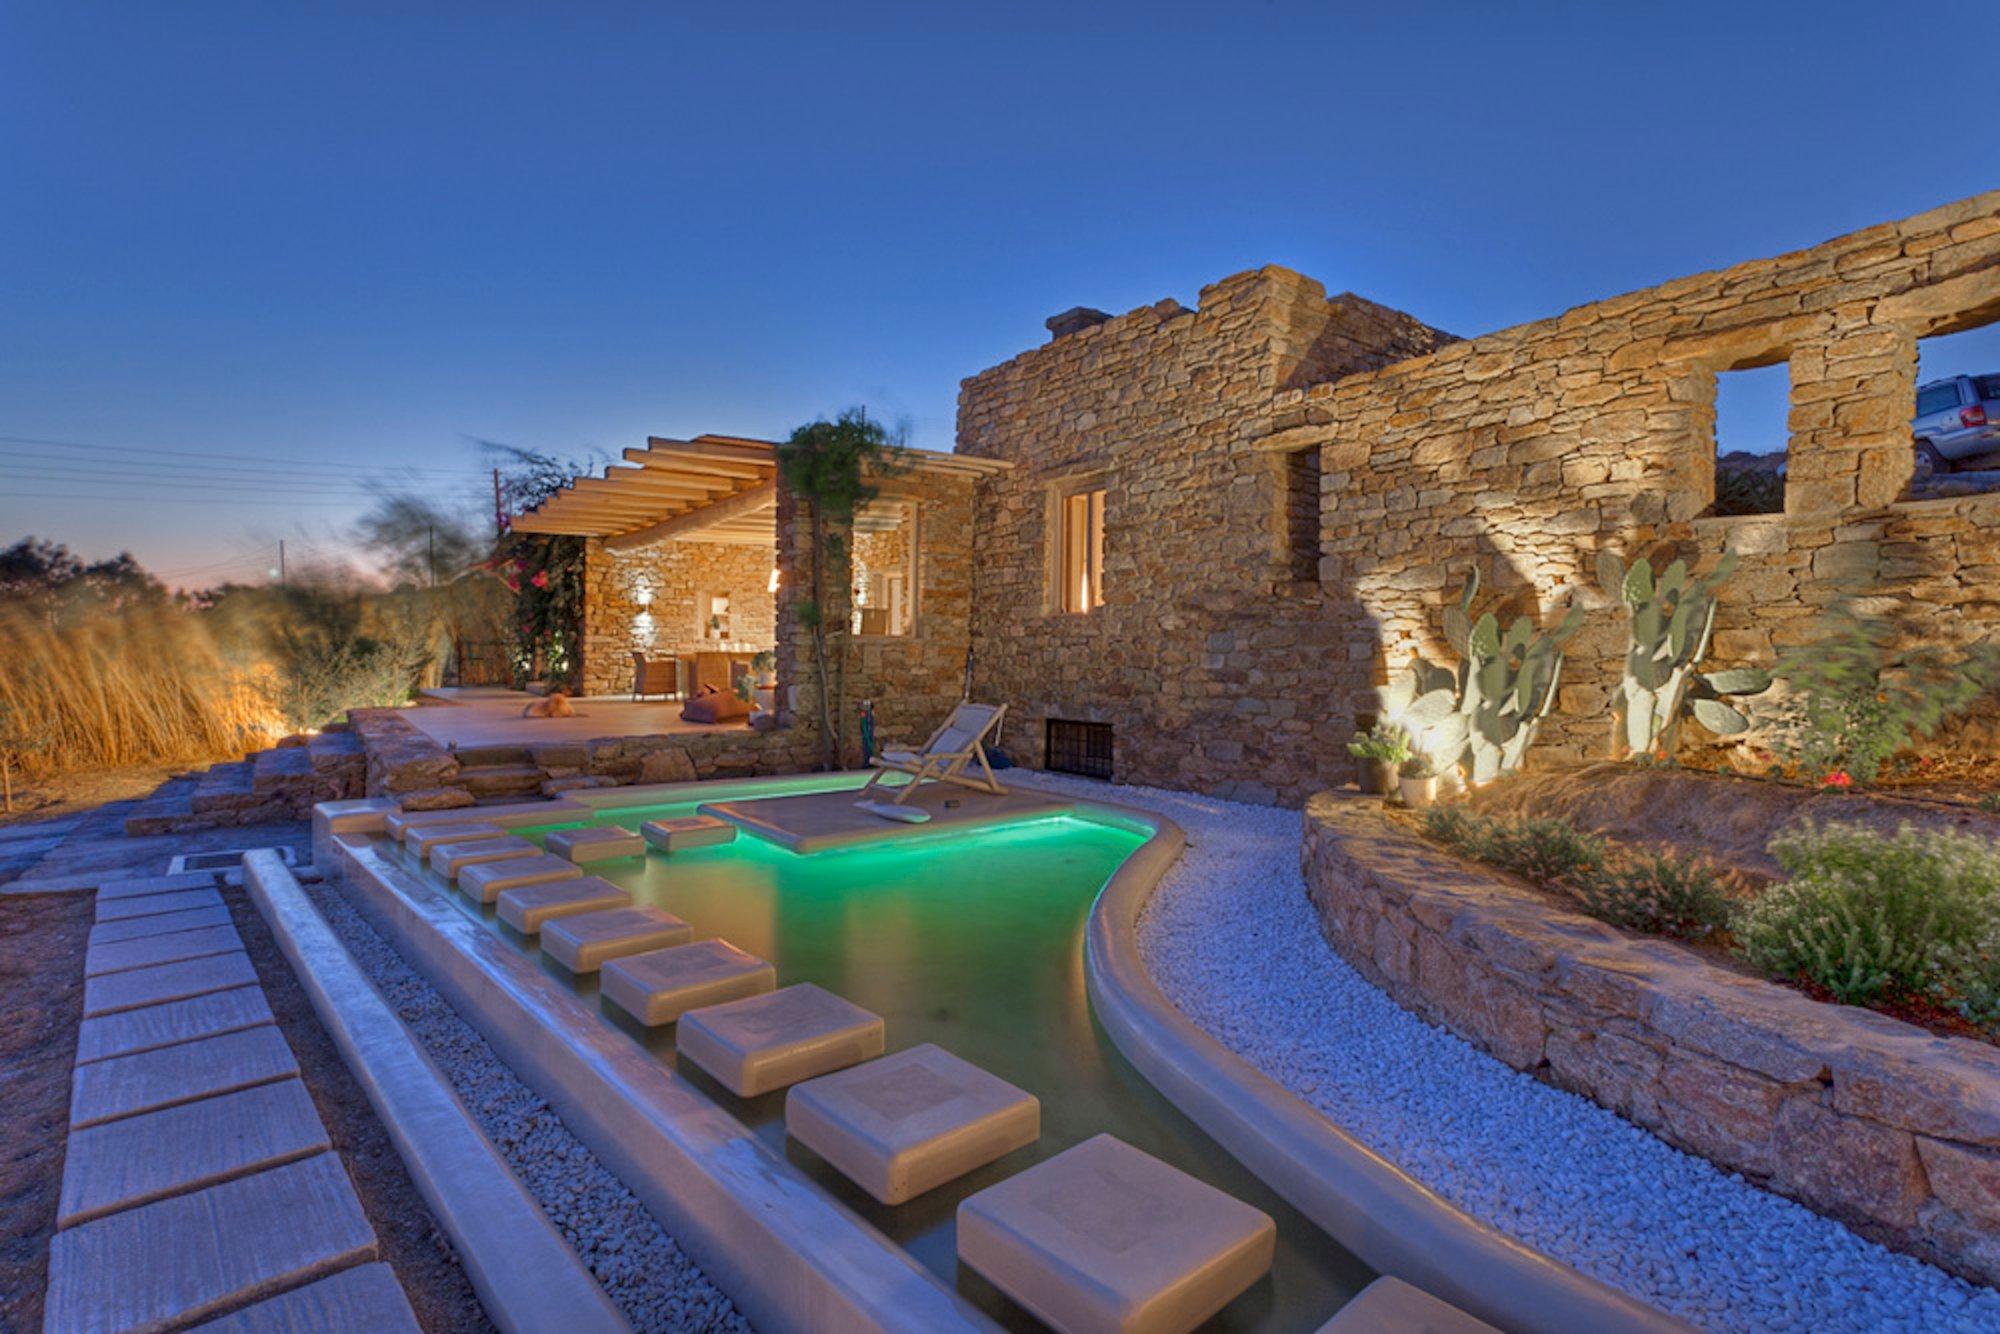 House in Mikonos, Greece 1